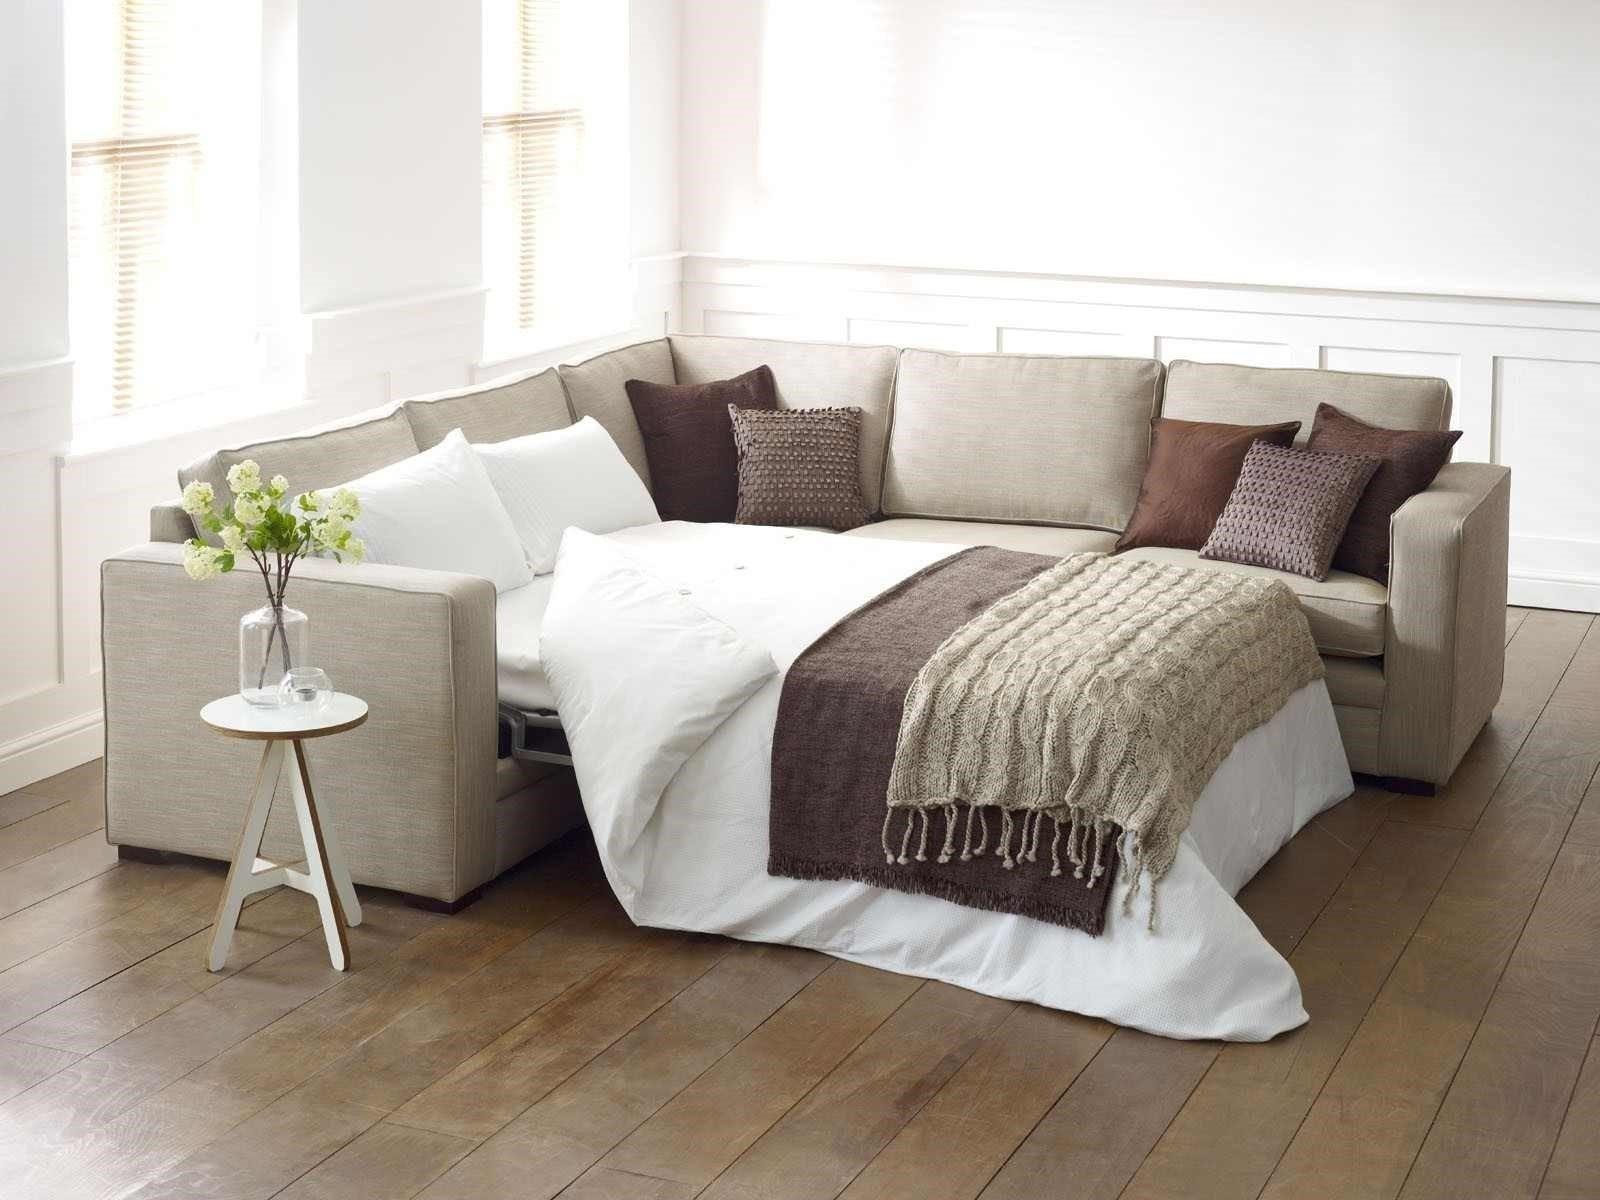 full american san bedroom size wonderful rhbedroomandmorecom of sofa sunbrella leather comfort sleeper gina comforter more u kalyn